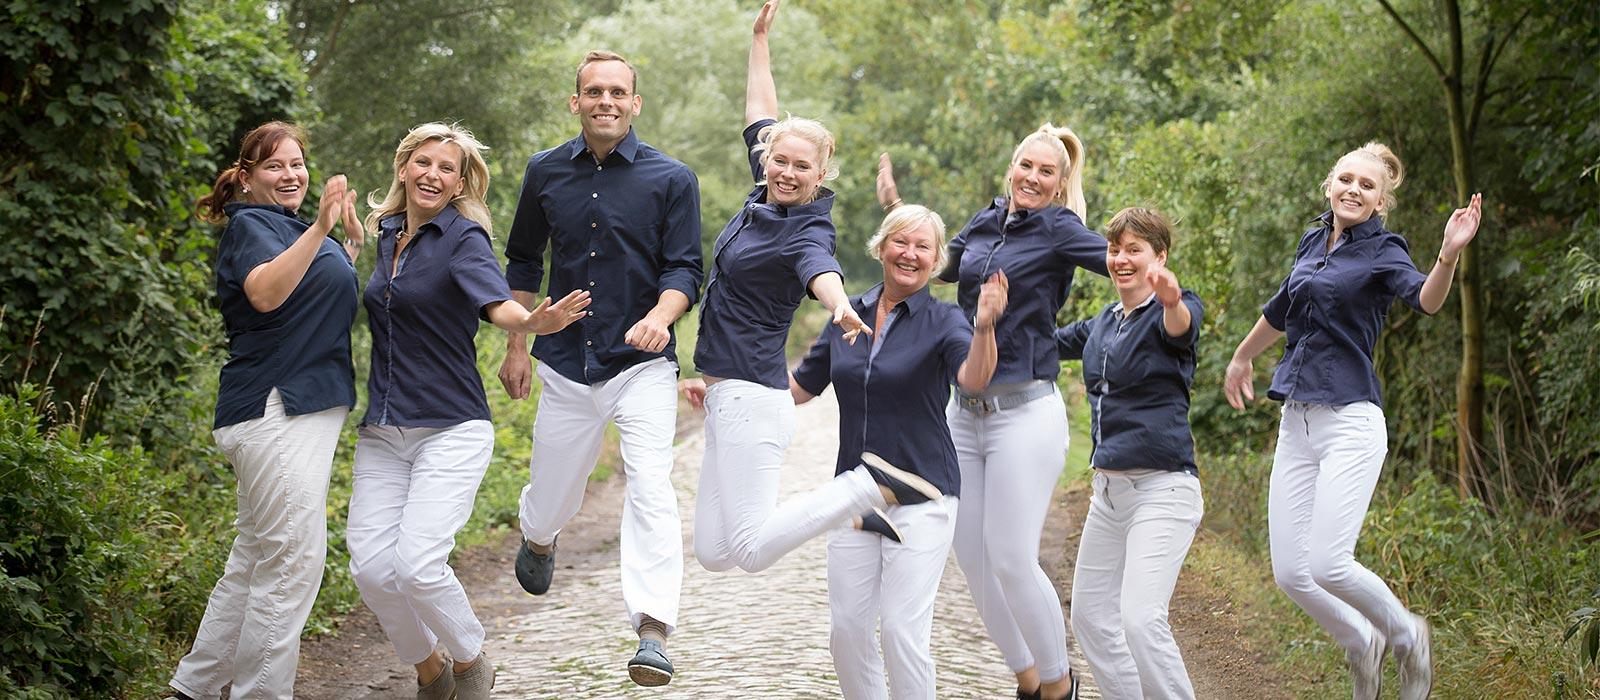 Zahnarztpraxis Dr.Gune in Dallgow-Döberitz - Das Team der Zahnarztpraxis Dr.Gune